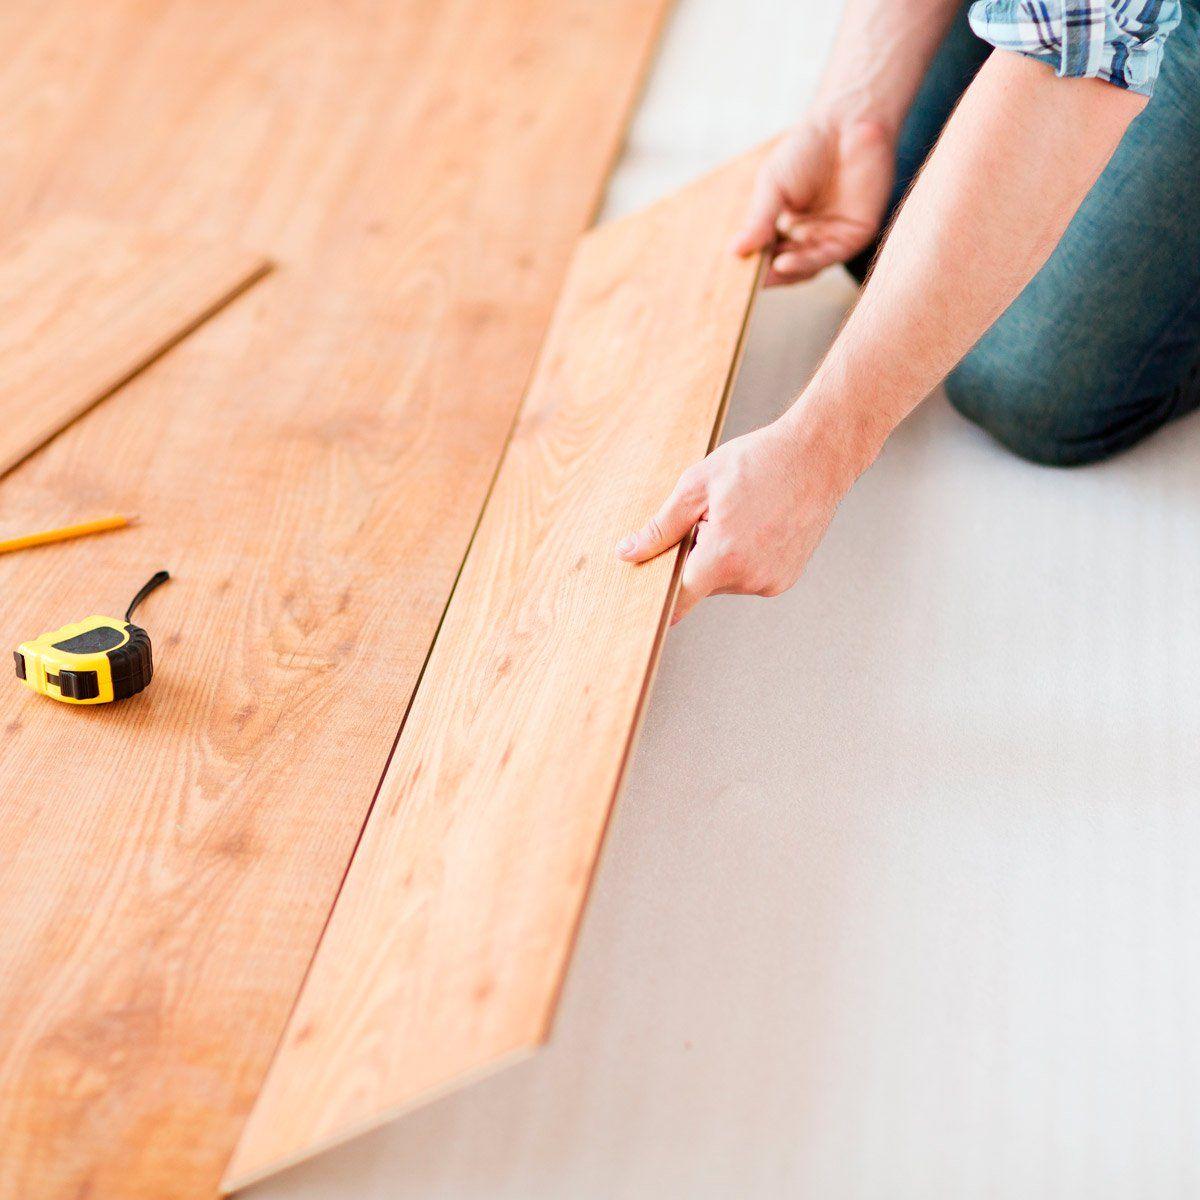 This Is The Absolute Best Flooring For Increasing Home Value Best Flooring Ceramic Floor Tiles Flooring